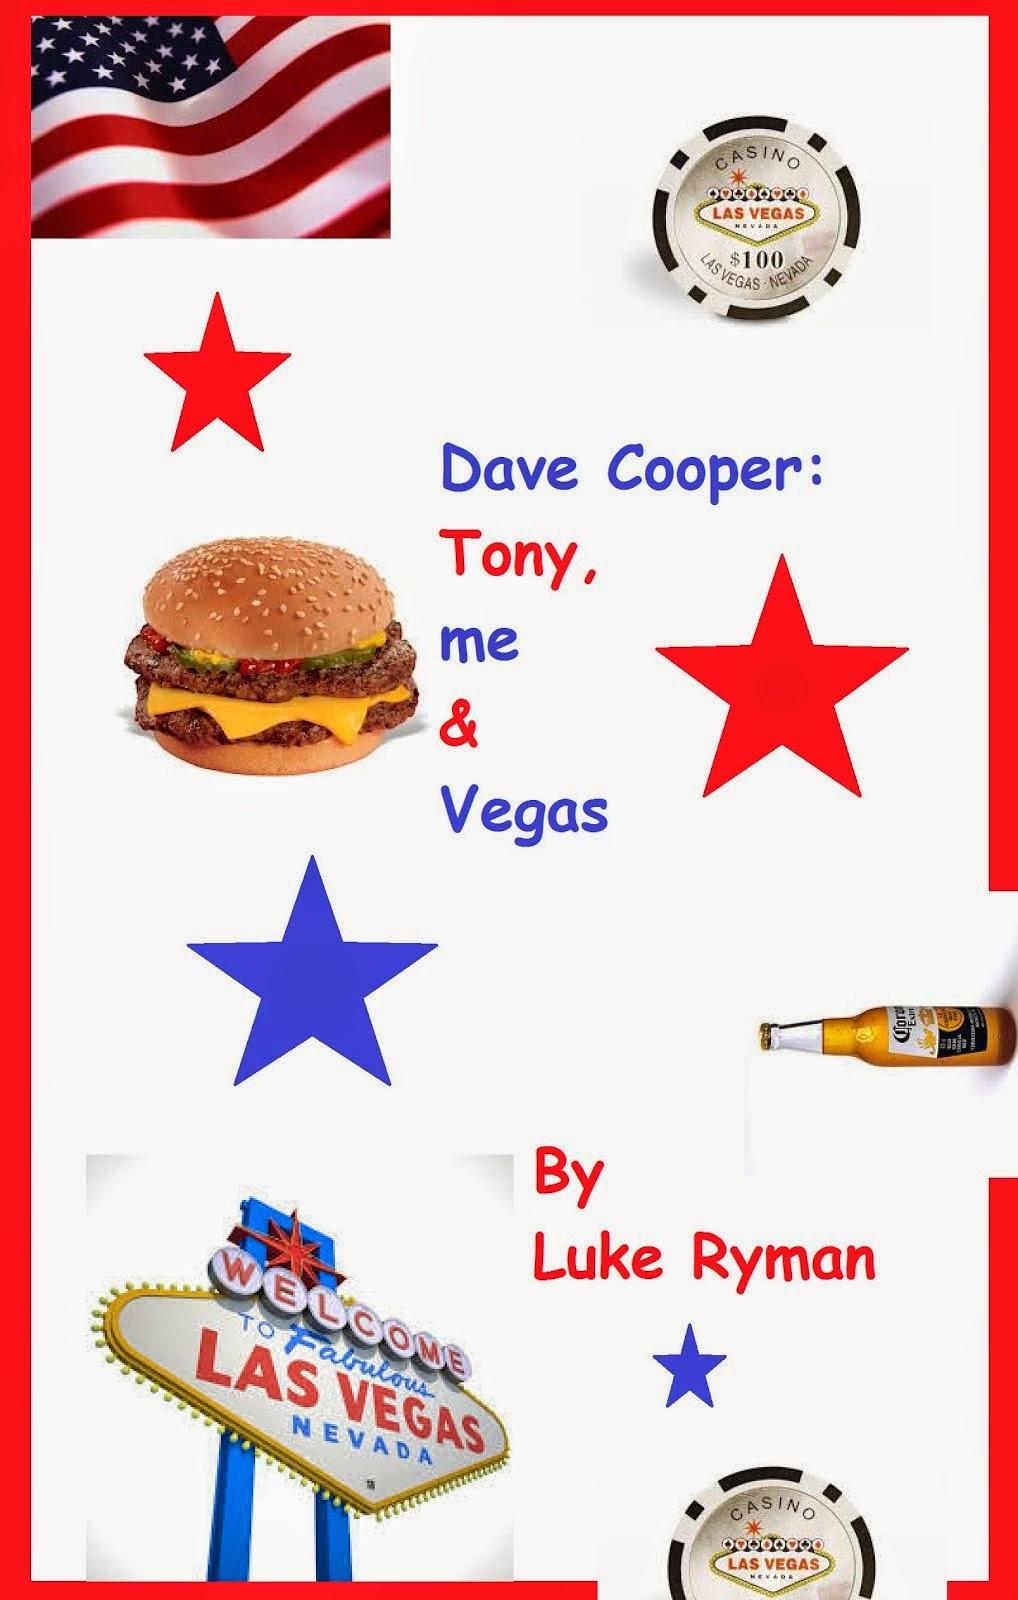 Dave Cooper: Tony, me & Vegas